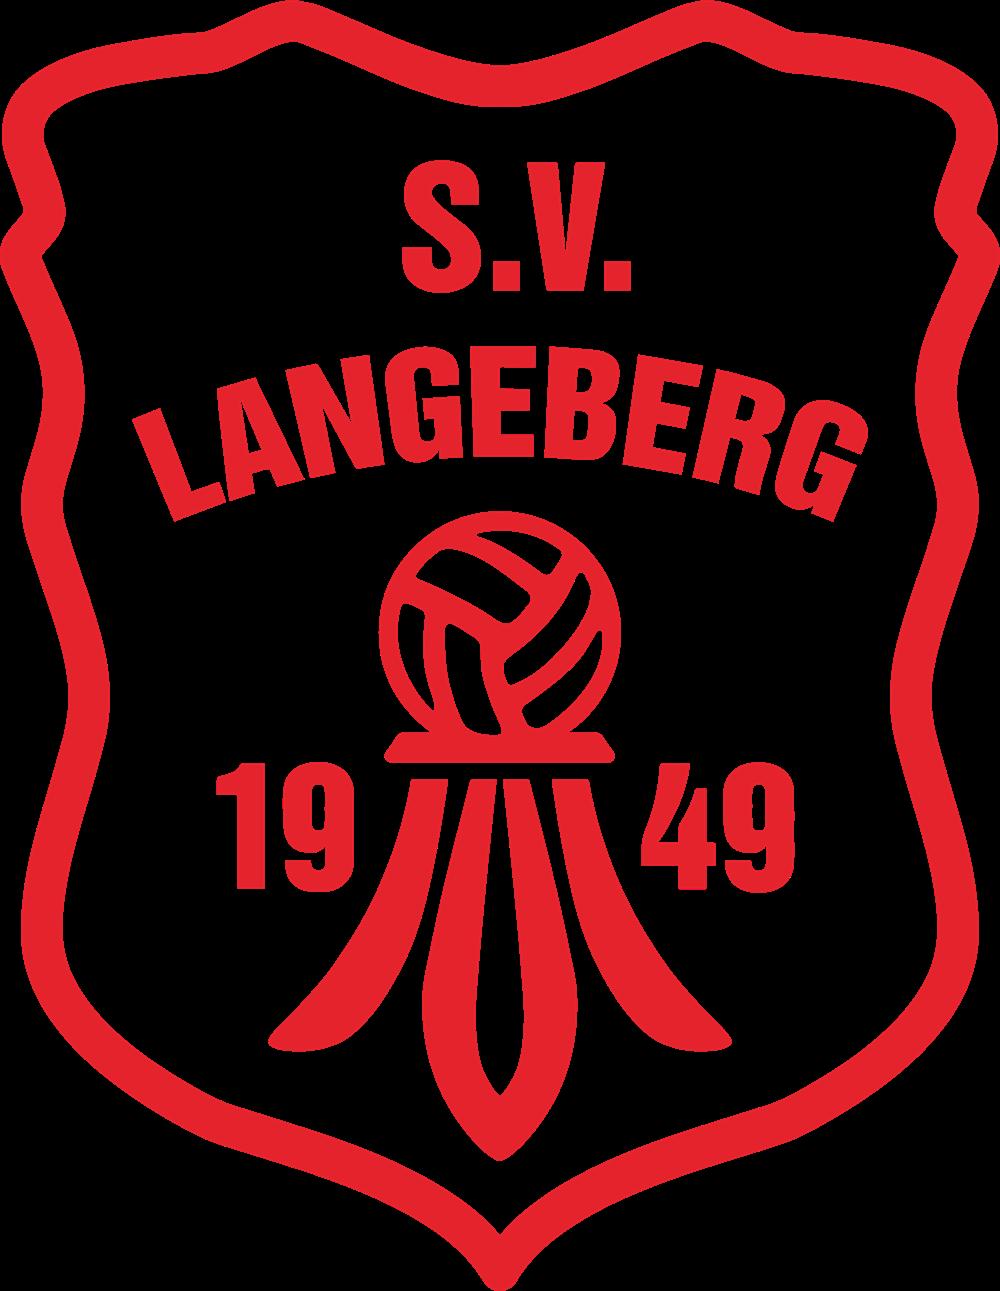 Langeberg_logo_rood_-_web.png